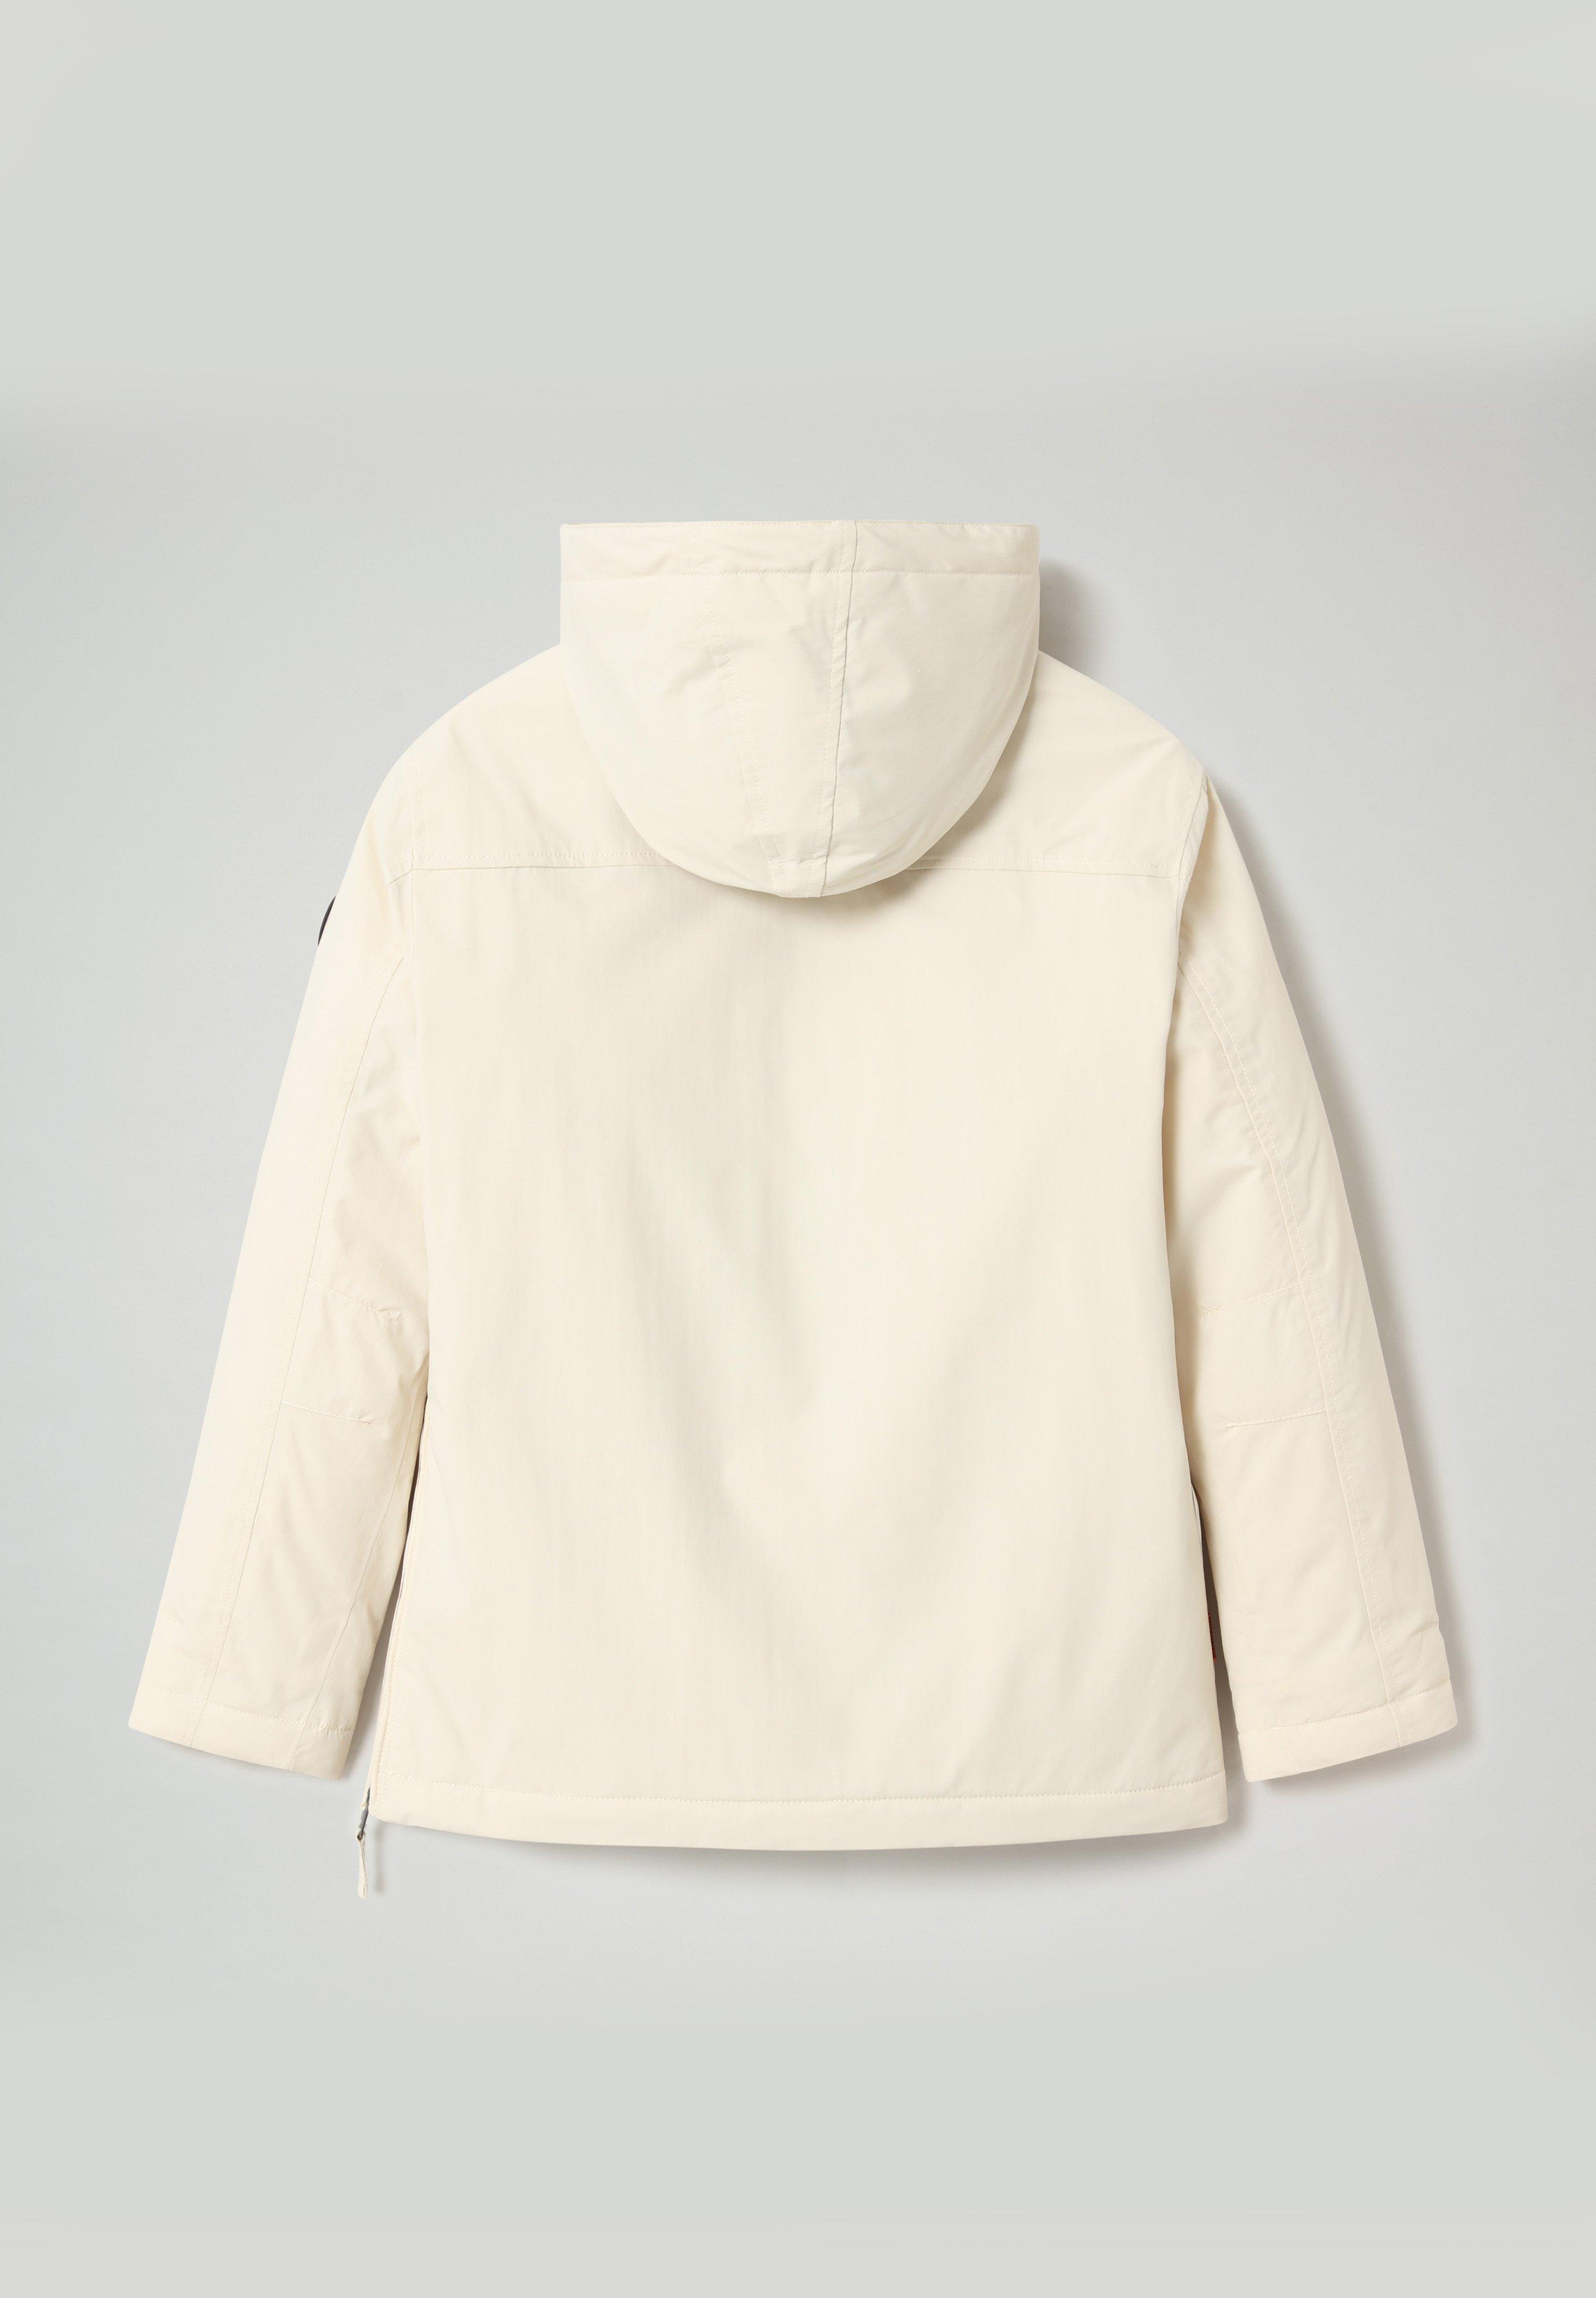 Napapijri RAINFOREST WINTER Übergangsjacke whitecap gray/hellgrau